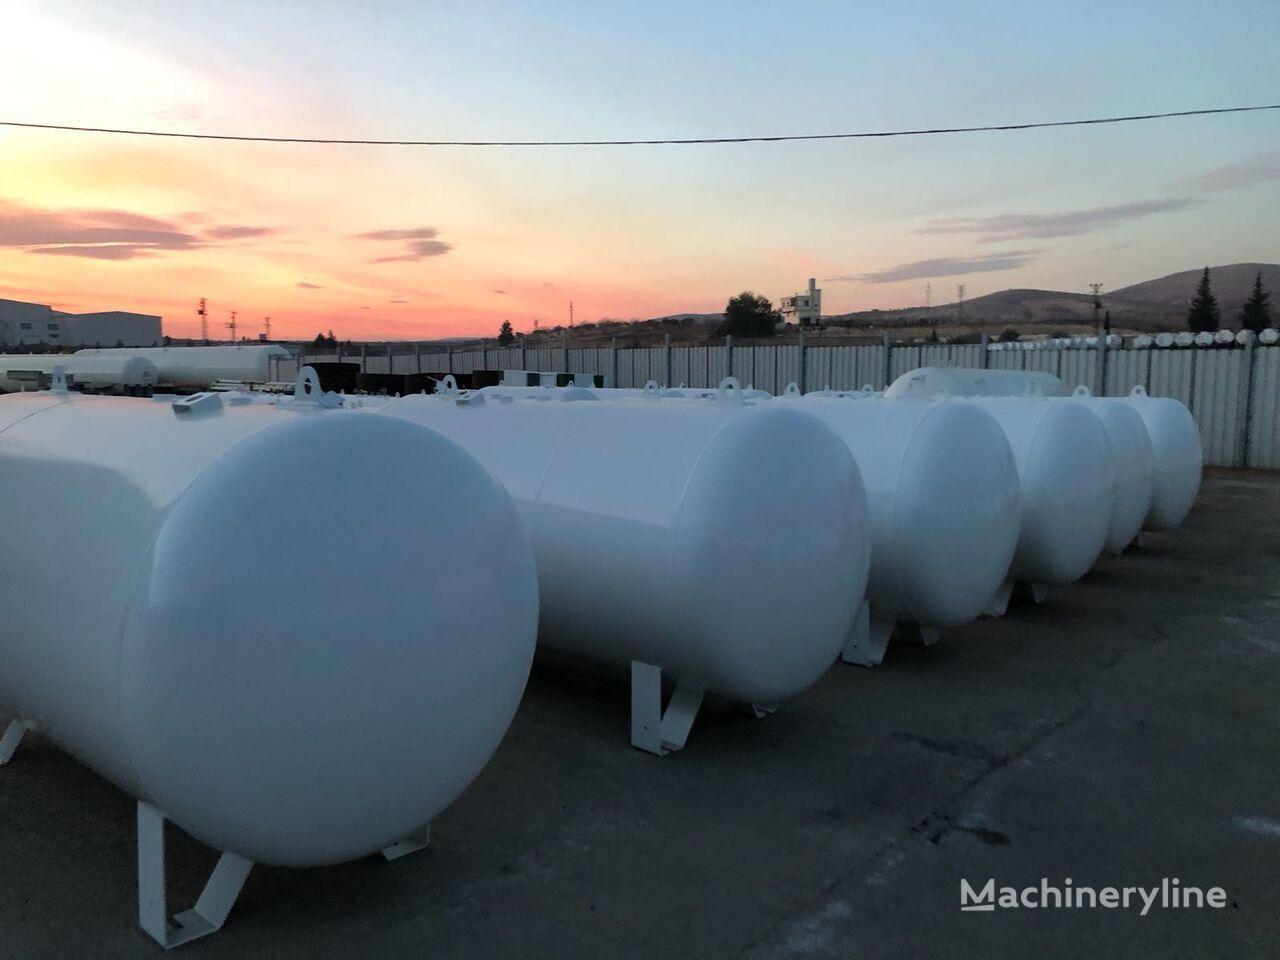 nova cisterna za plin Micansan 2020 MODEL 10 M3 LPG STORAGES FULL ACCESORIES